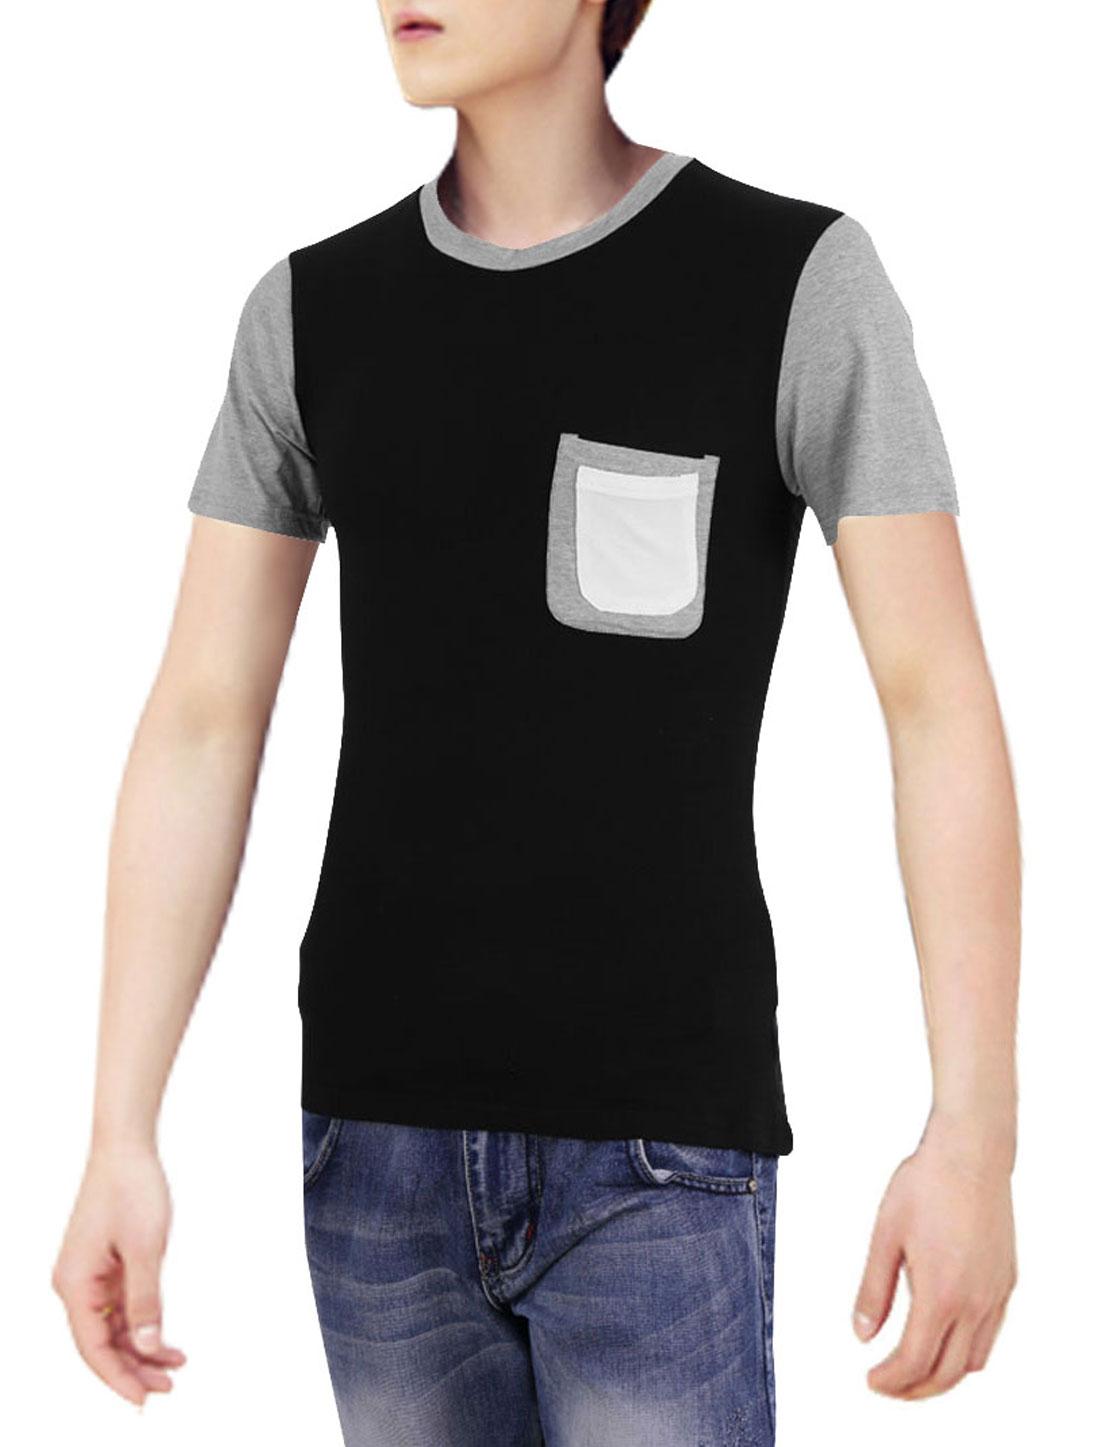 Men Spliced Stretchy Stylish Round Neck Leisure Modern Shirt Black S